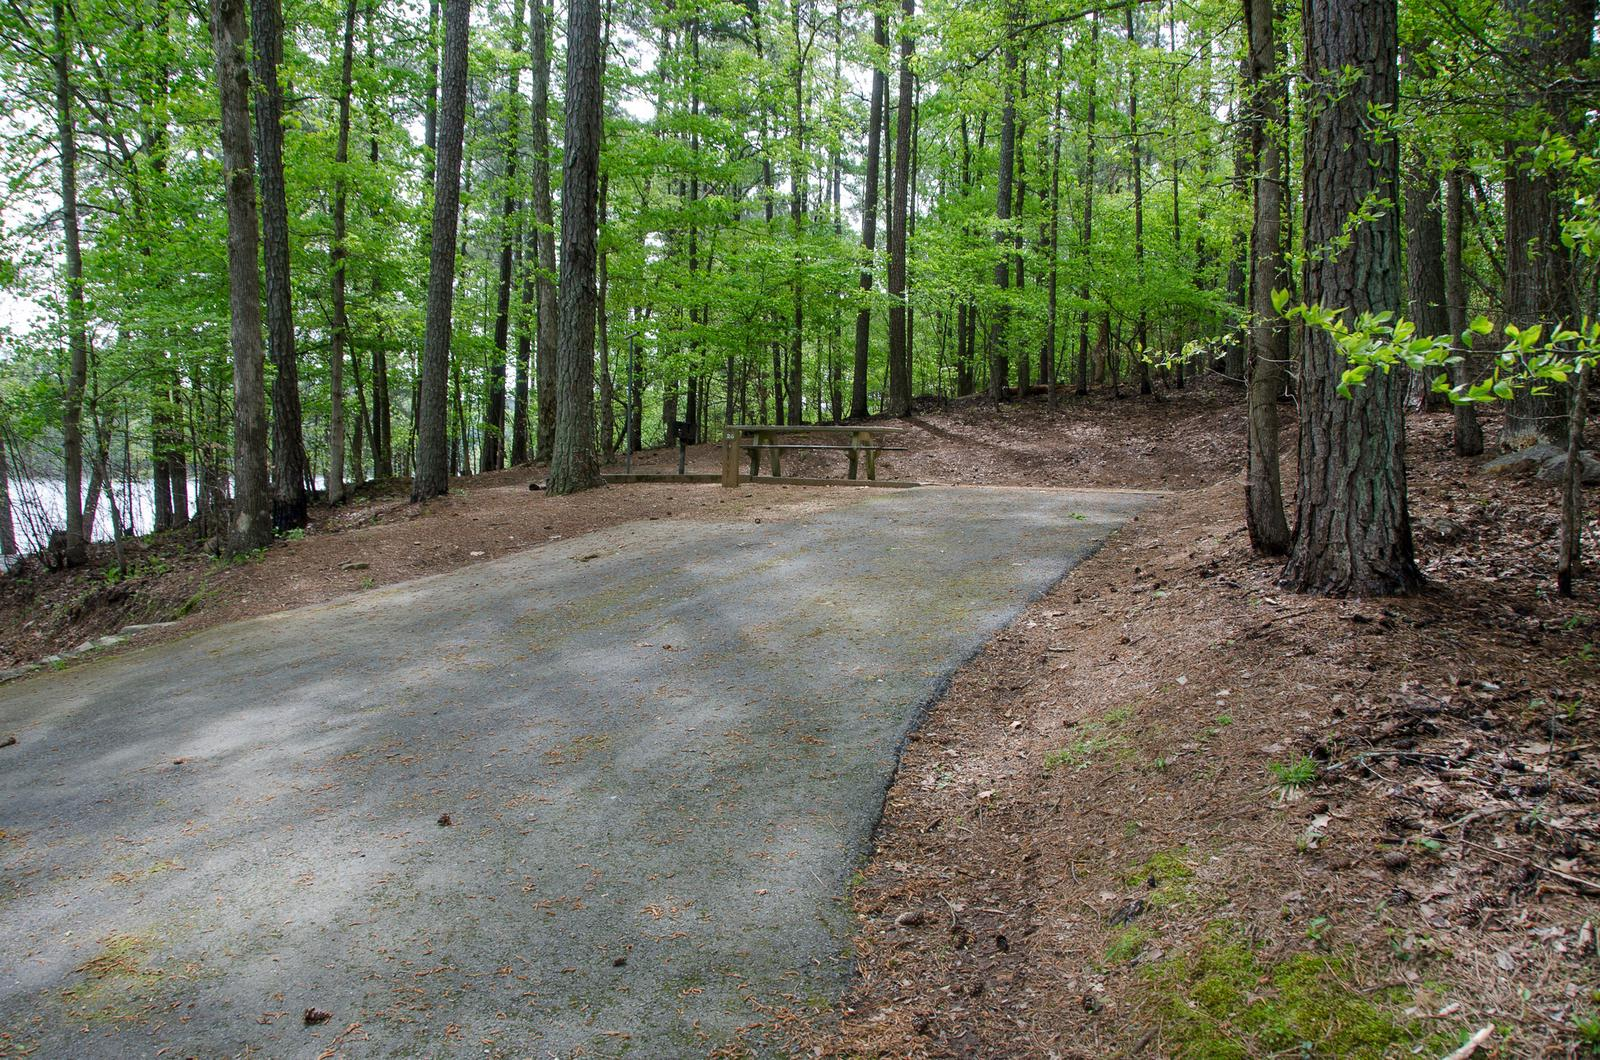 Driveway slopeMcKaskey Creek Campground, campsite #26